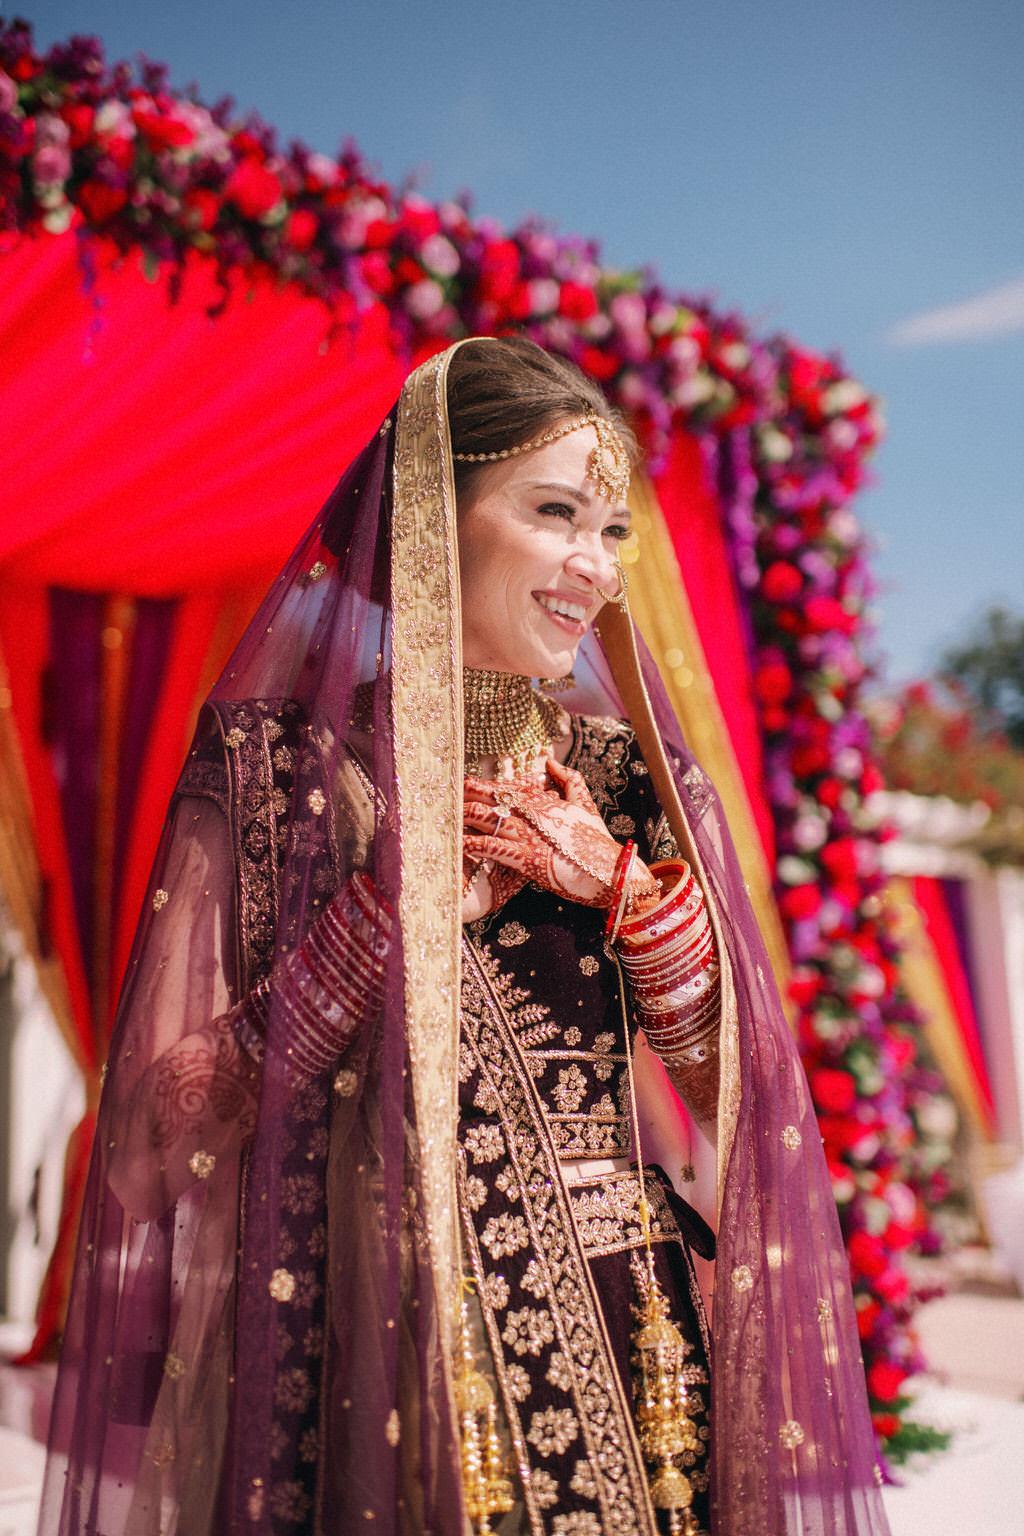 Elegant Luxurious Traditional Indian Bride in Custom Purple Velvet, Black and Gold Lehenga, Extravagant Gold Bridal Jewelry Beauty Wedding Portrait | Tampa Bay Bridal Hair and Makeup Artist Michele Renee The Studio